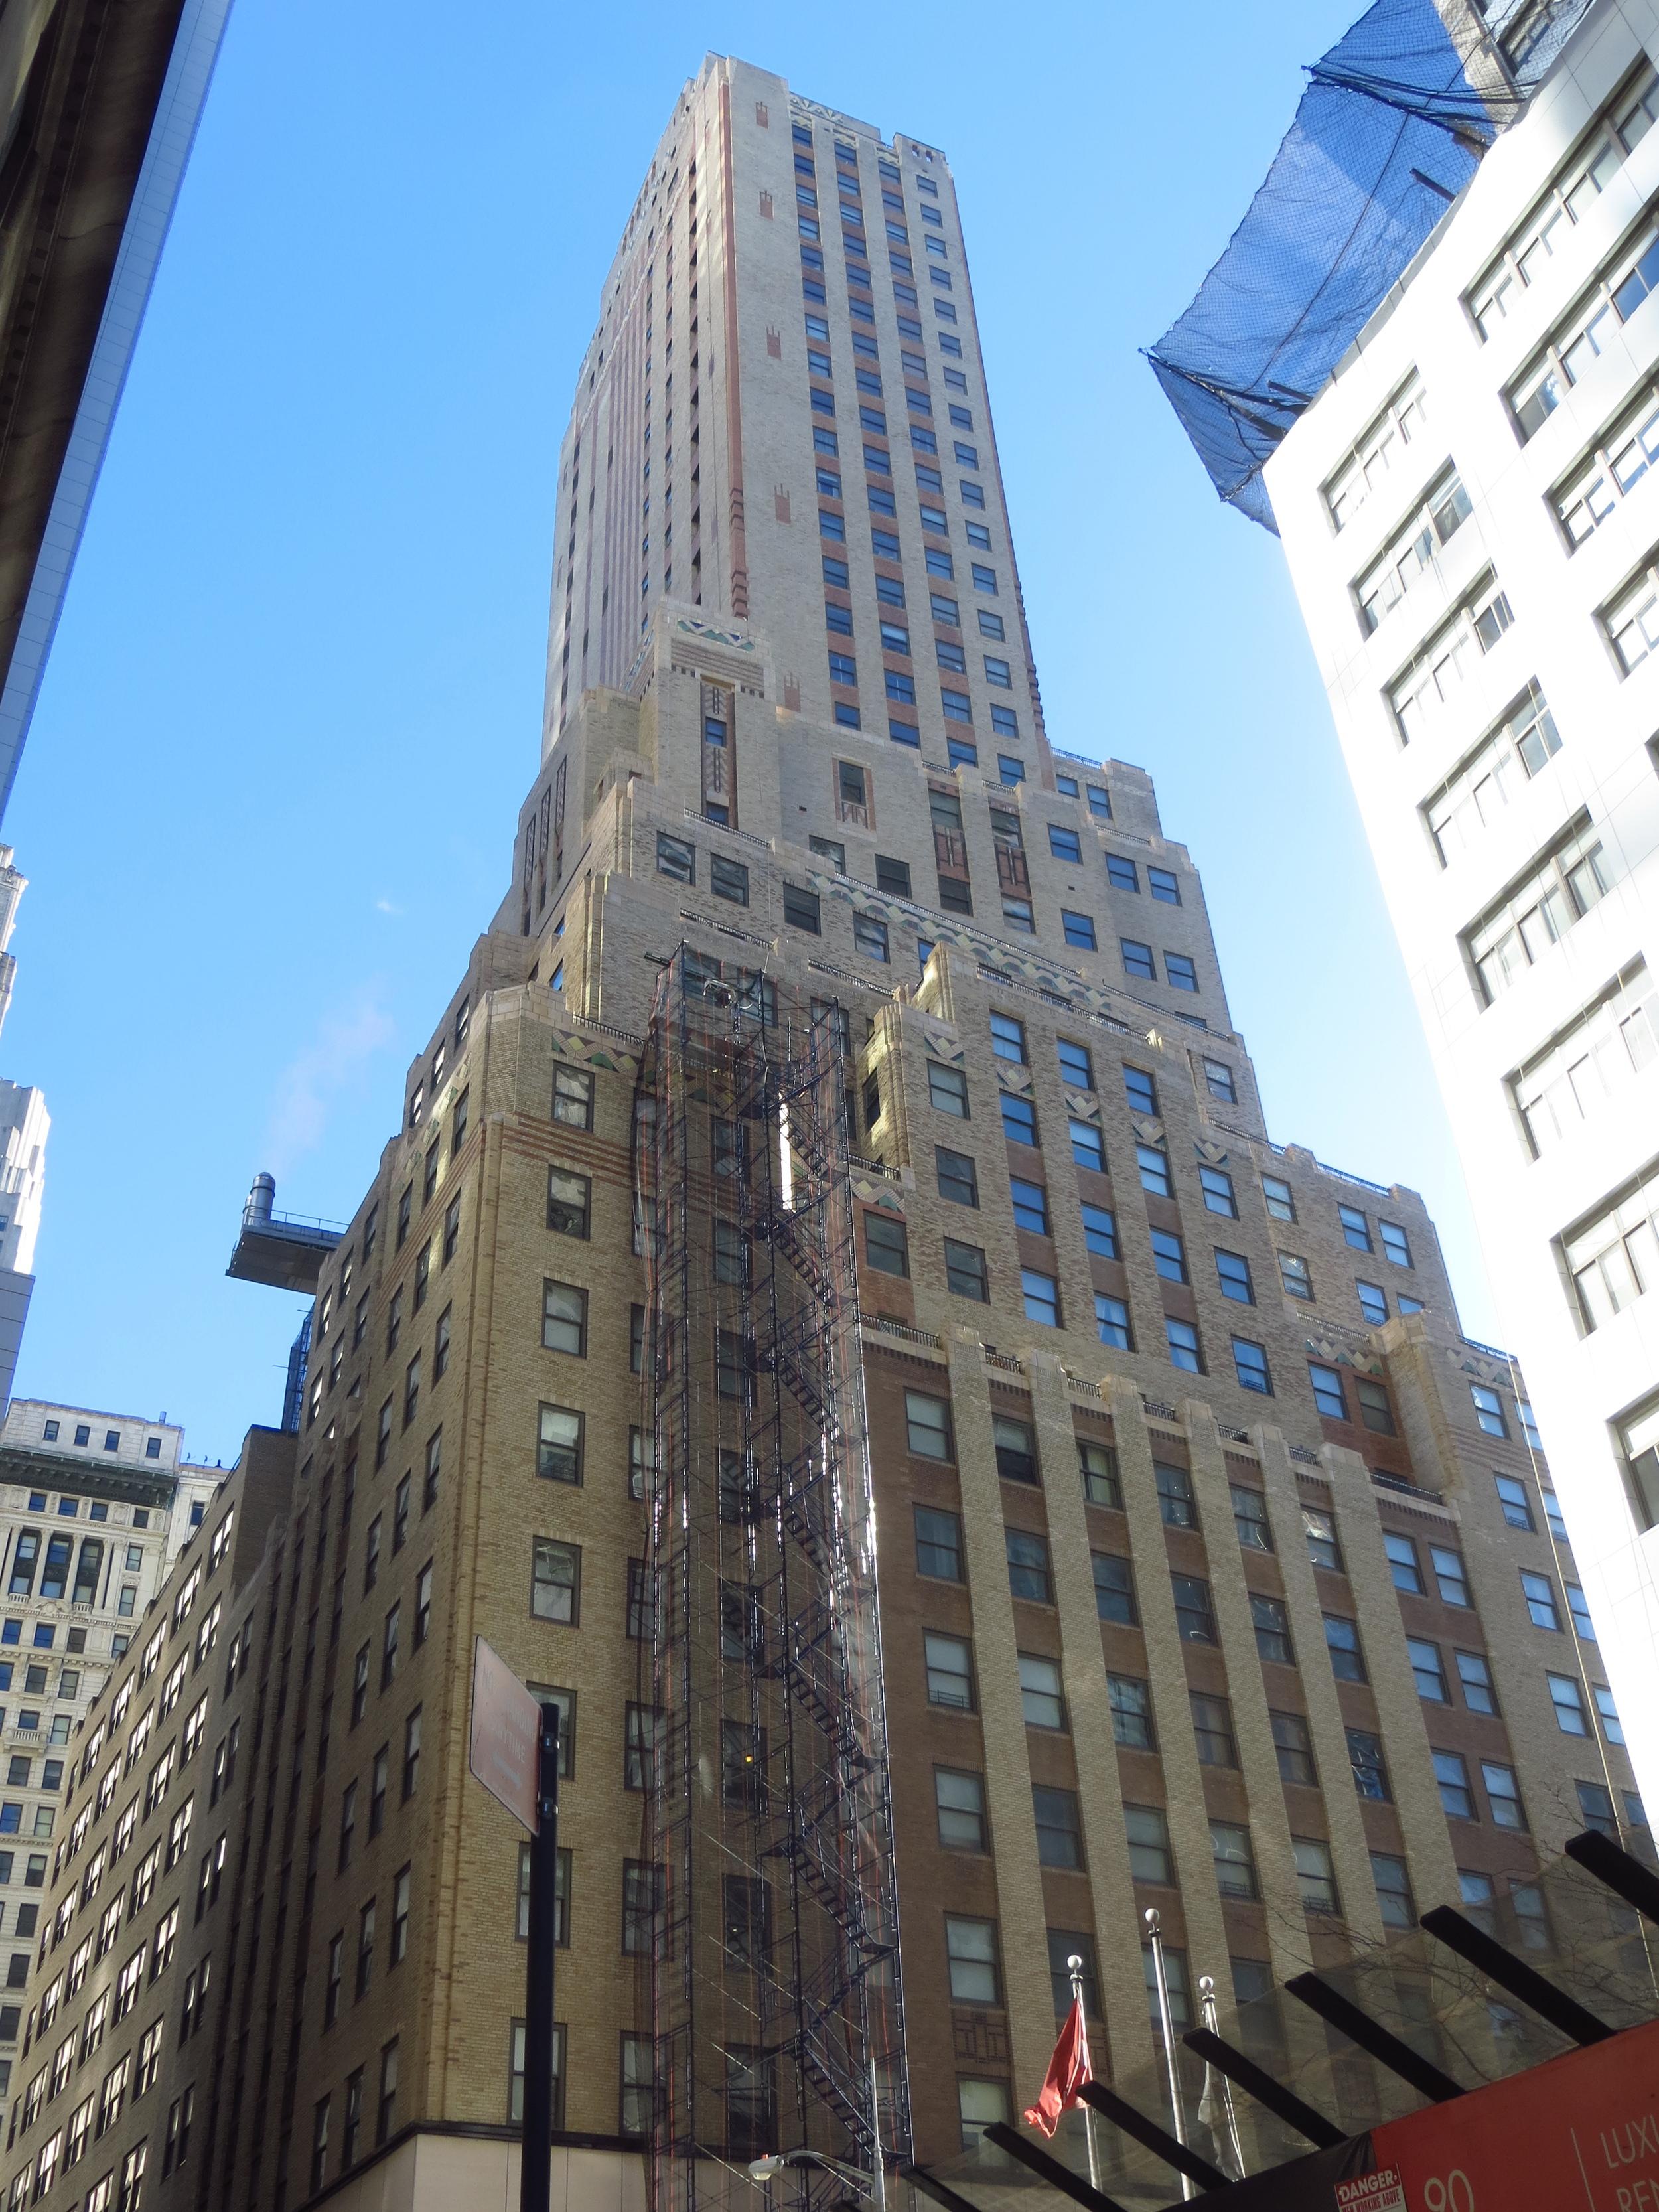 Cool Art Deco building